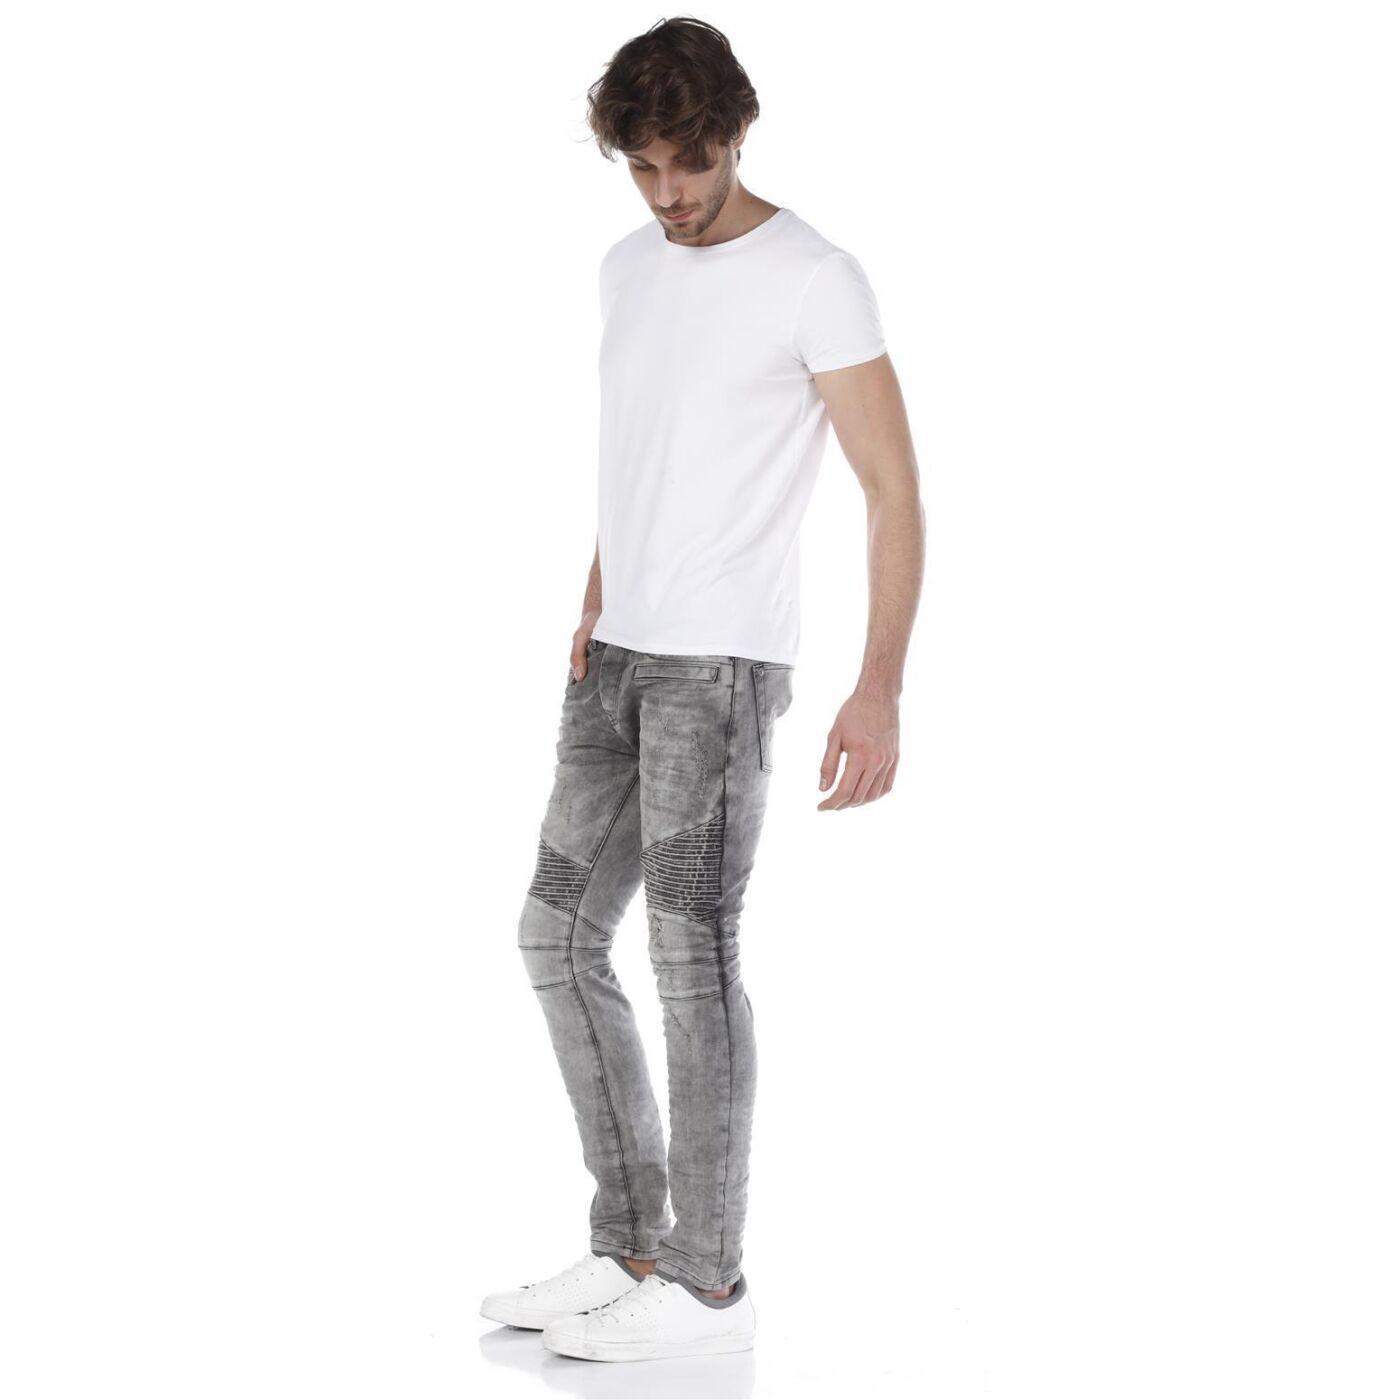 8e34f5eaf6157 Red Bridge Herren Biker Skinny Röhrenjeans Jeans Pants Denim grau